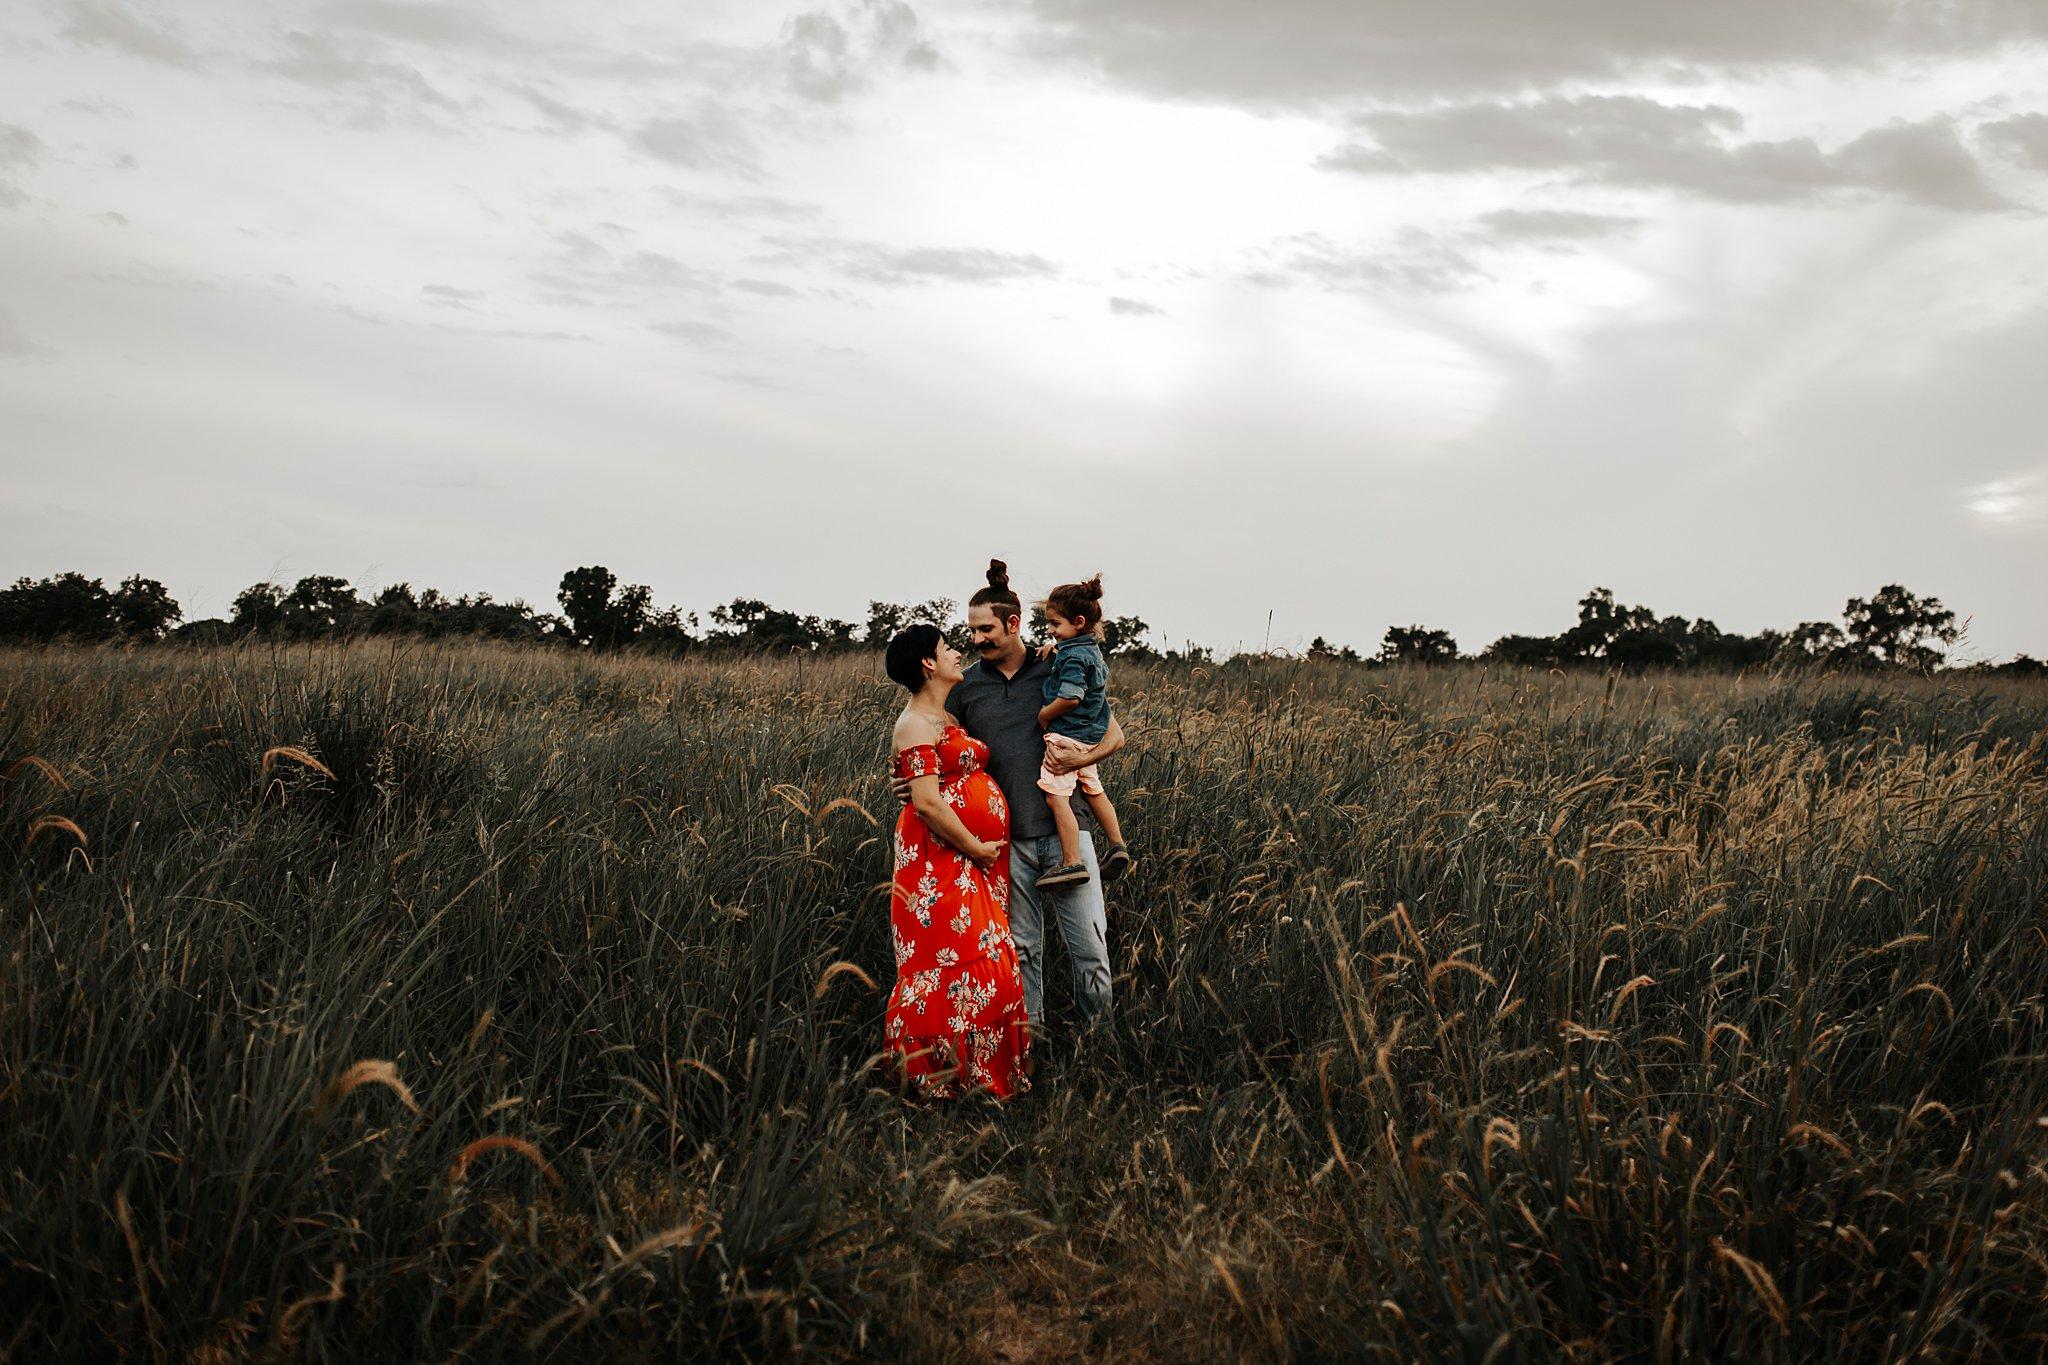 Meagan-San-Antonio-Maternity-Photographer-55_WEB.jpg